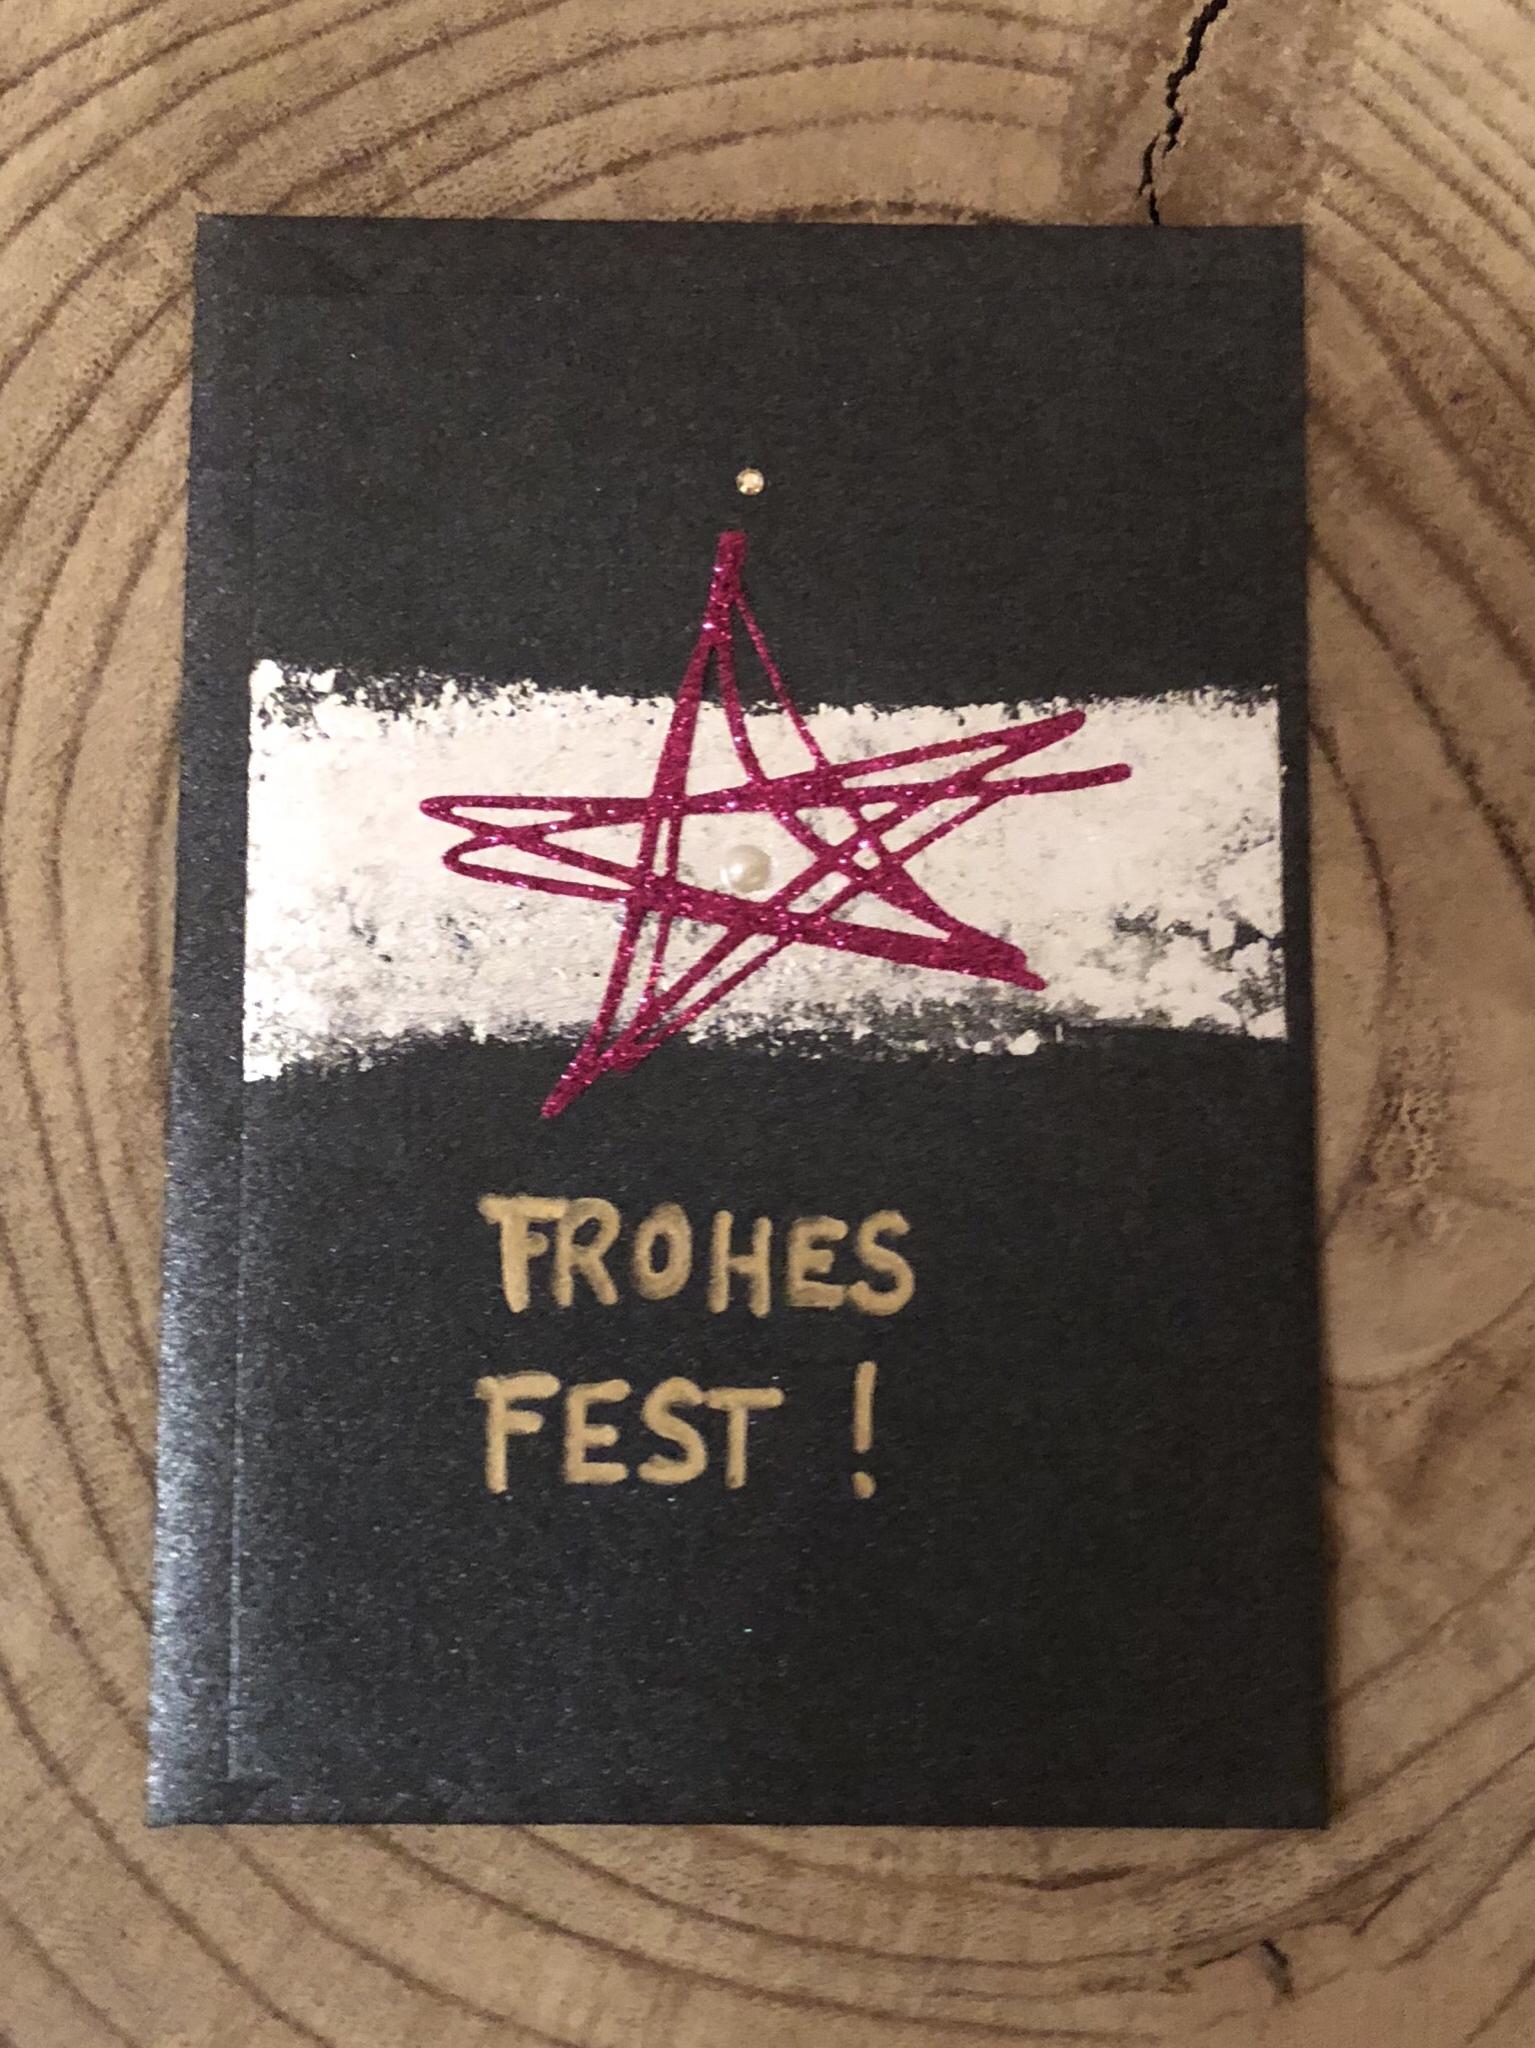 Karte nachtblau metallic - Frohes Fest! 00229